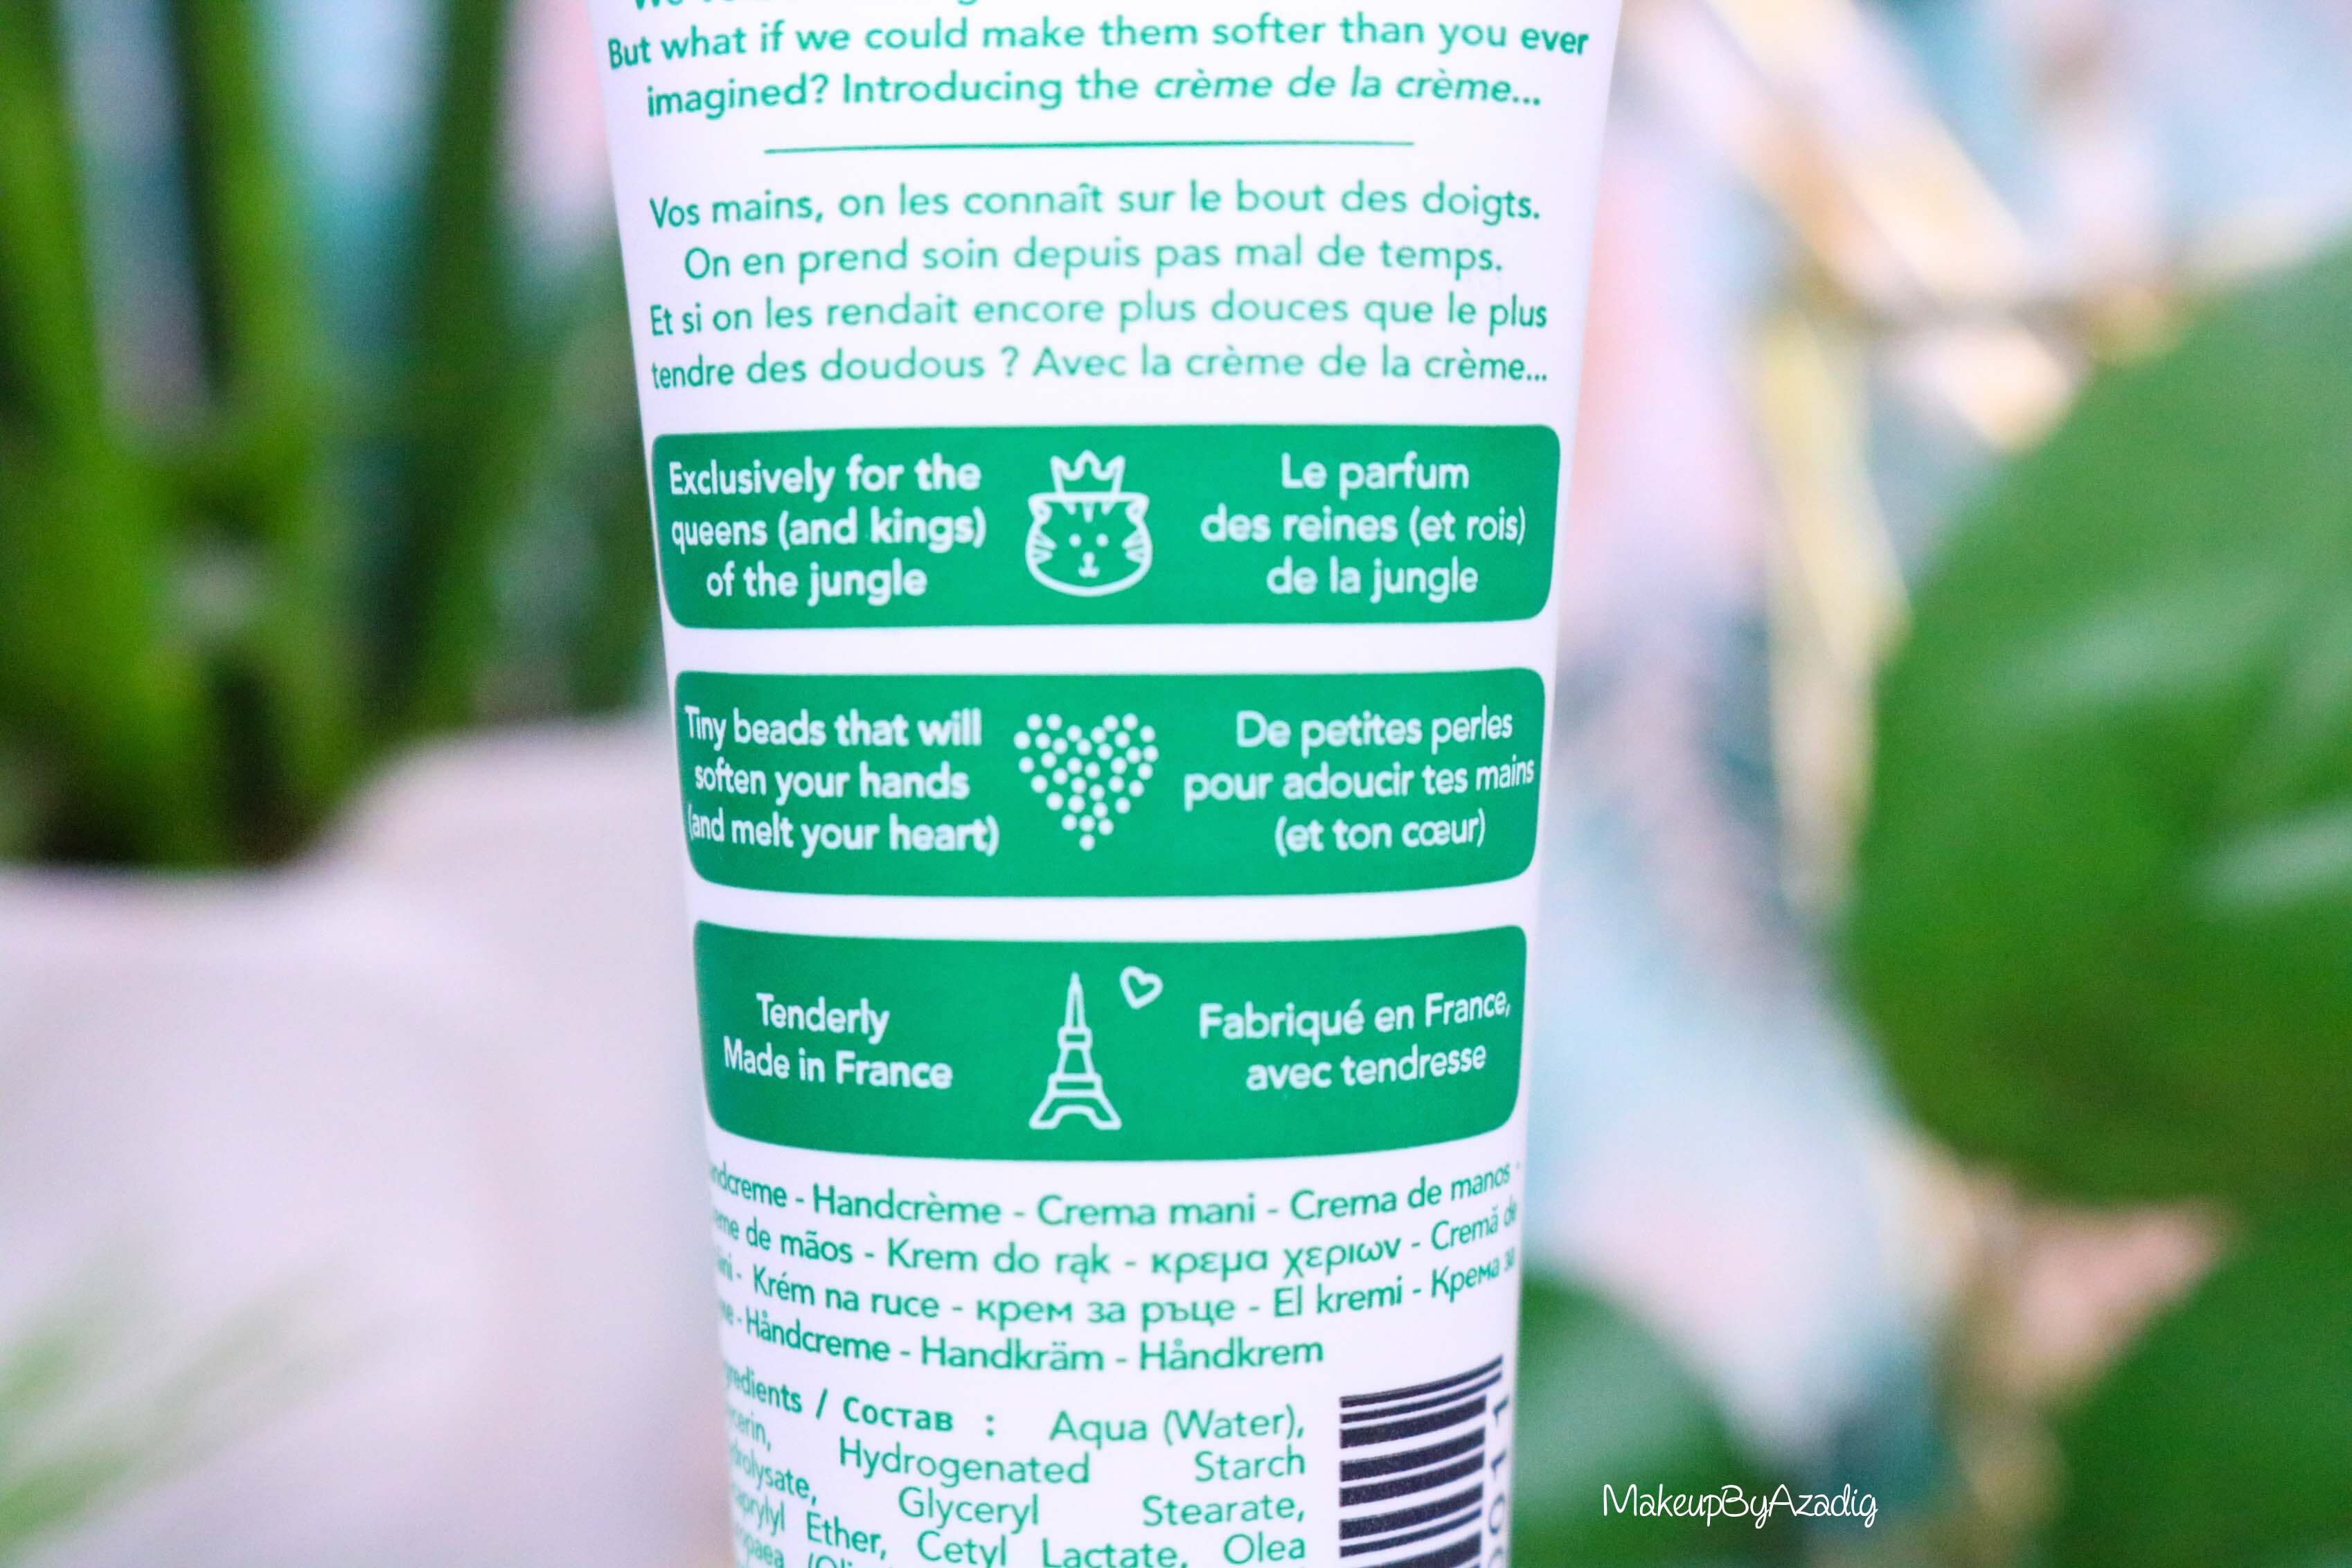 revue-merci-handy-jungle-fever-makeupbyazadig-nouvelle-senteur-gel-antibacteriens-creme-mains-bougie-sephora-avis-prix-love